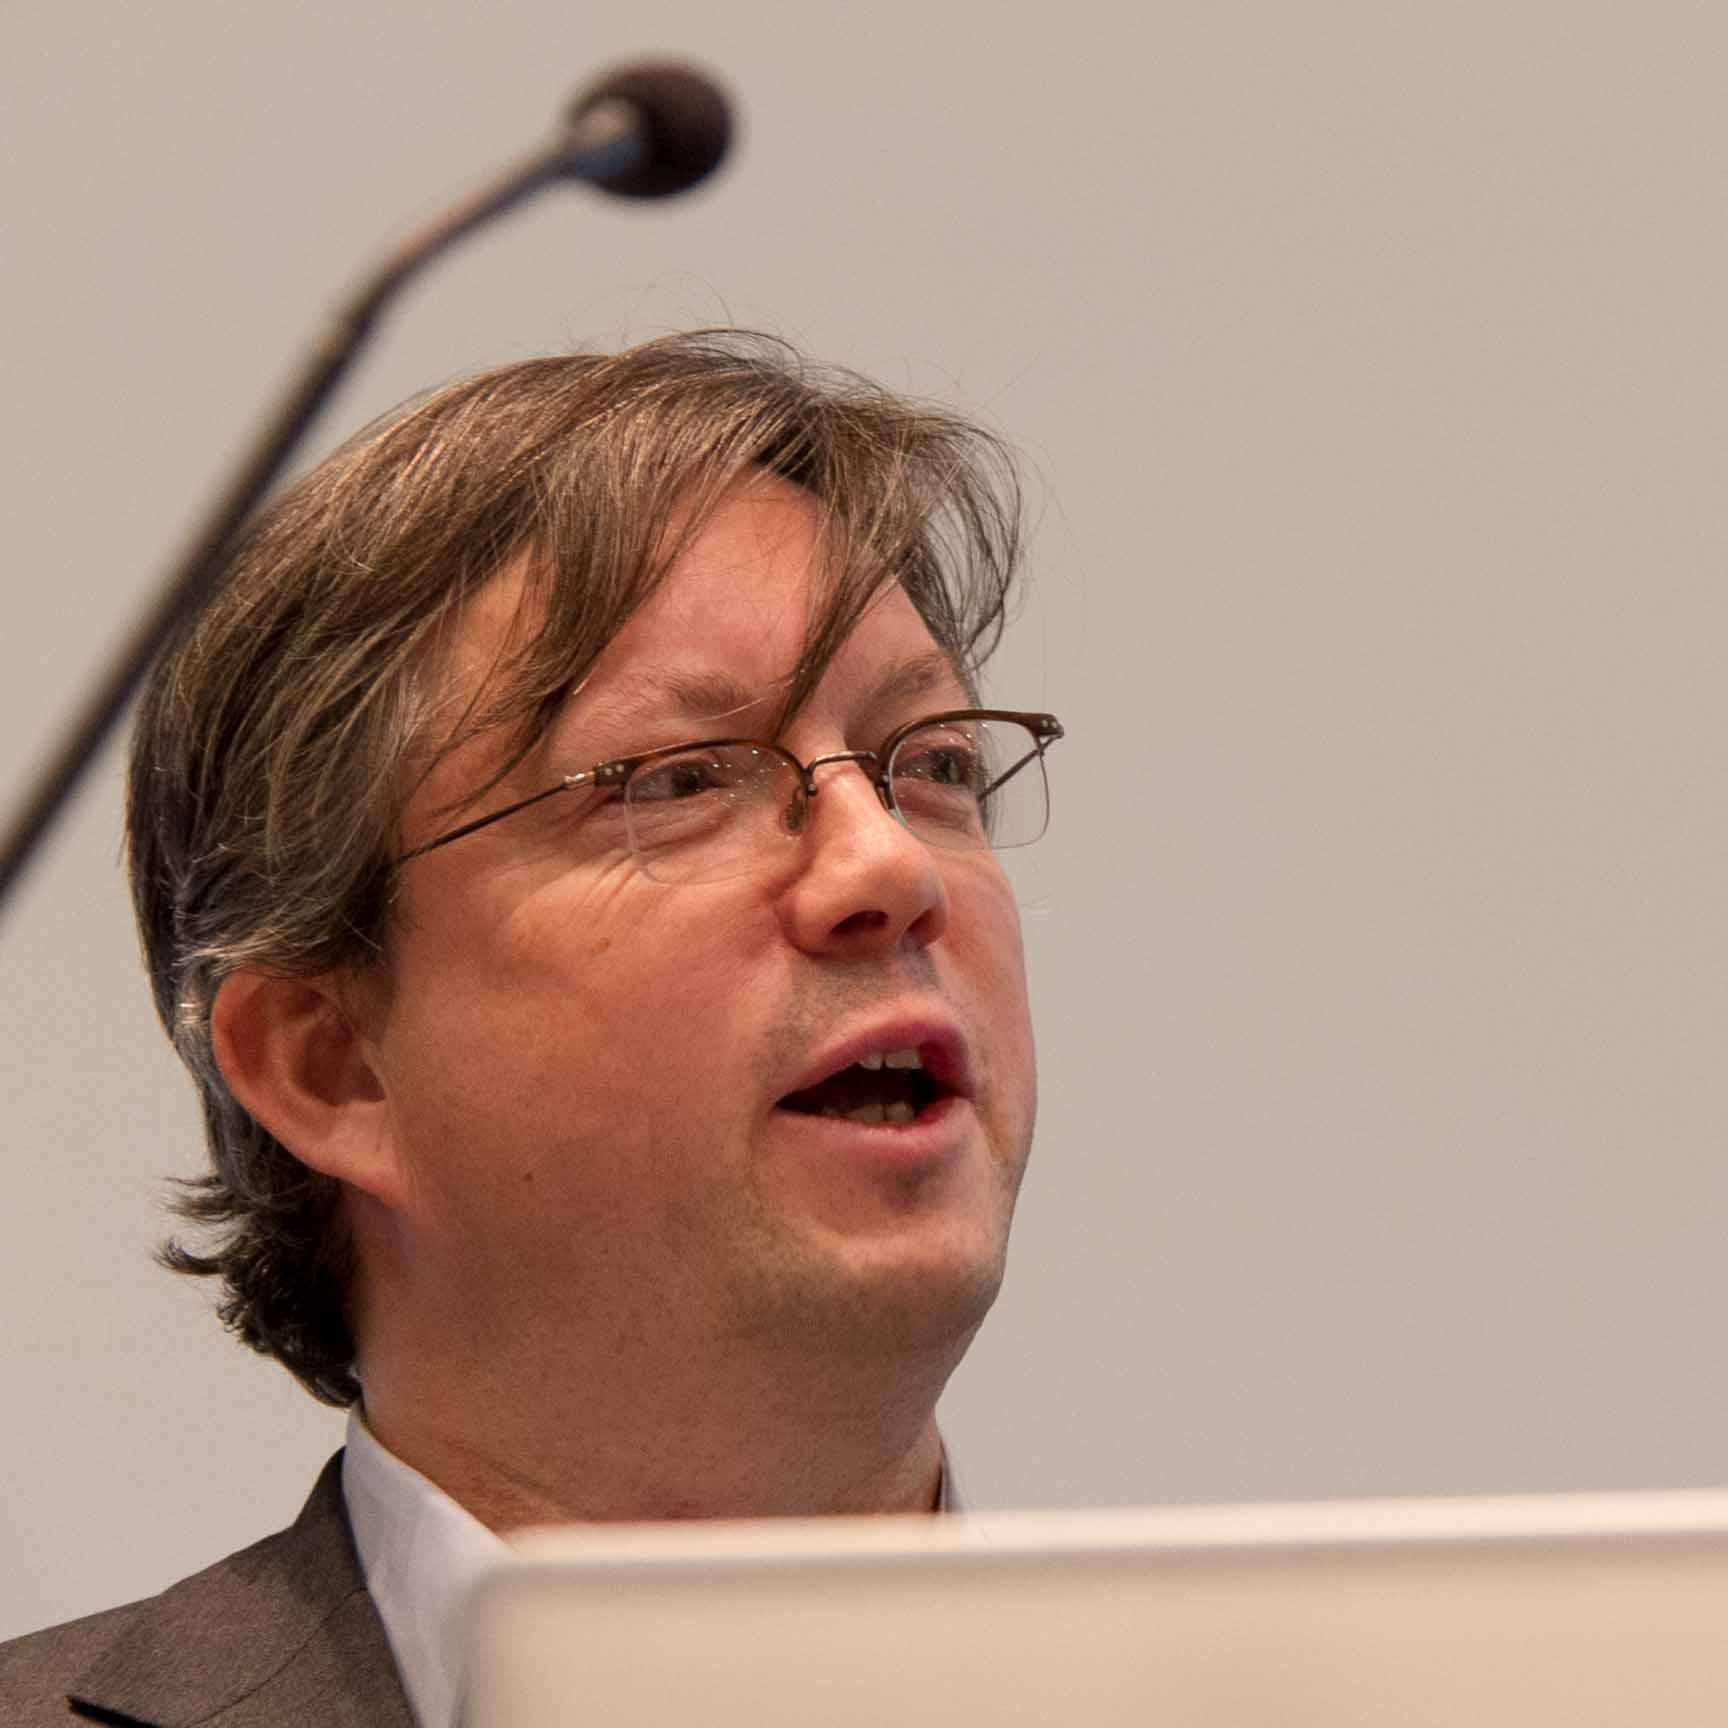 Joerg-Grundhoeffer-Siemens-Building-Technologies-Online-Communications